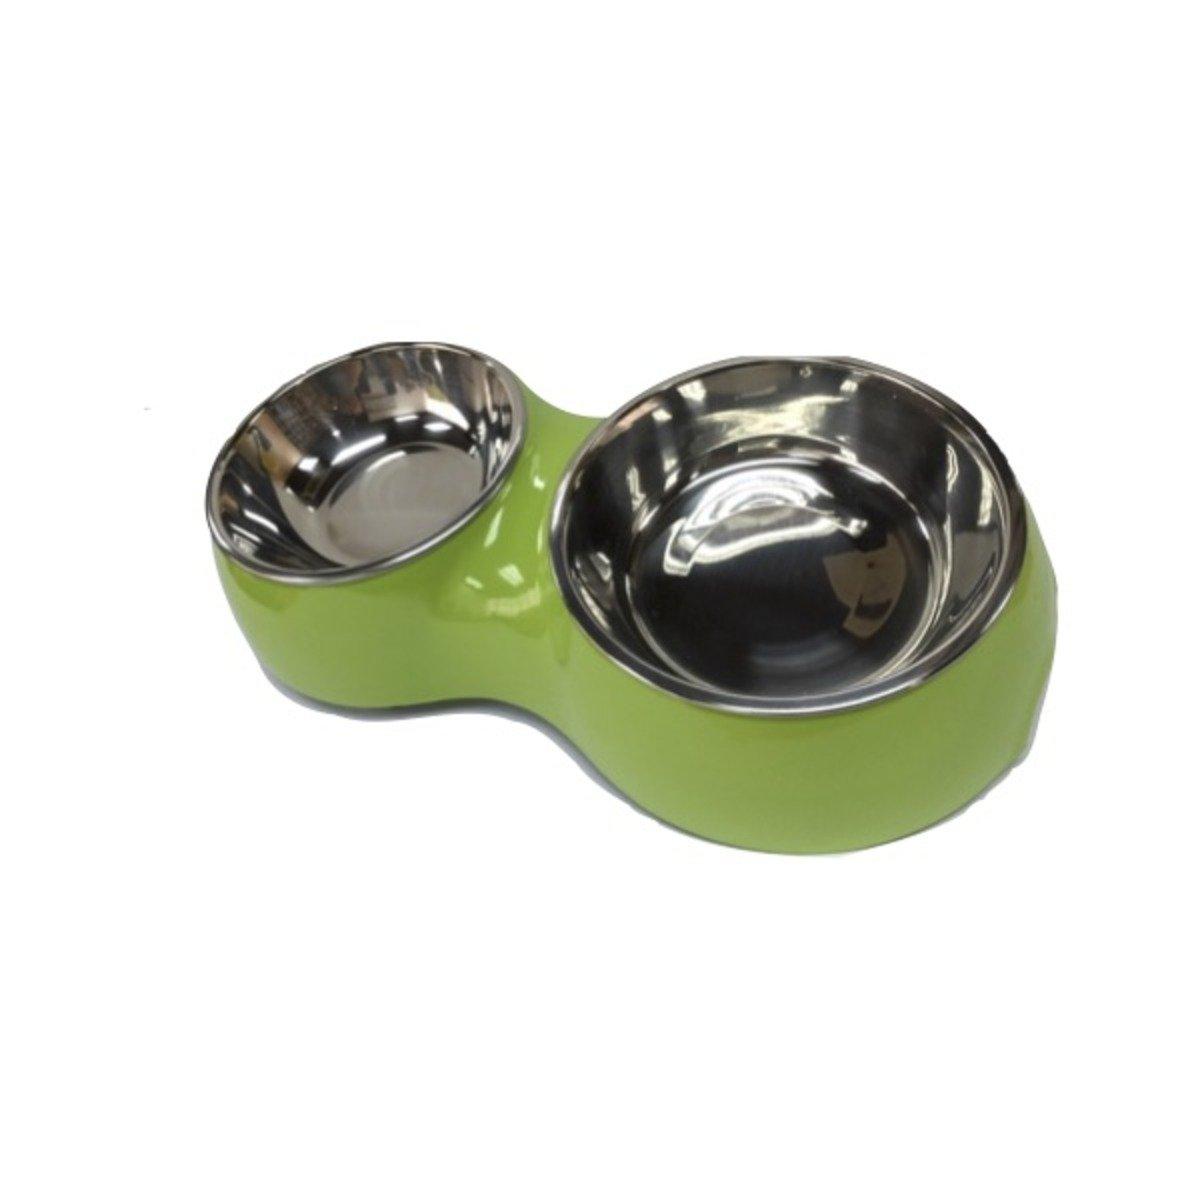 可折式雙碗糧碗(綠)